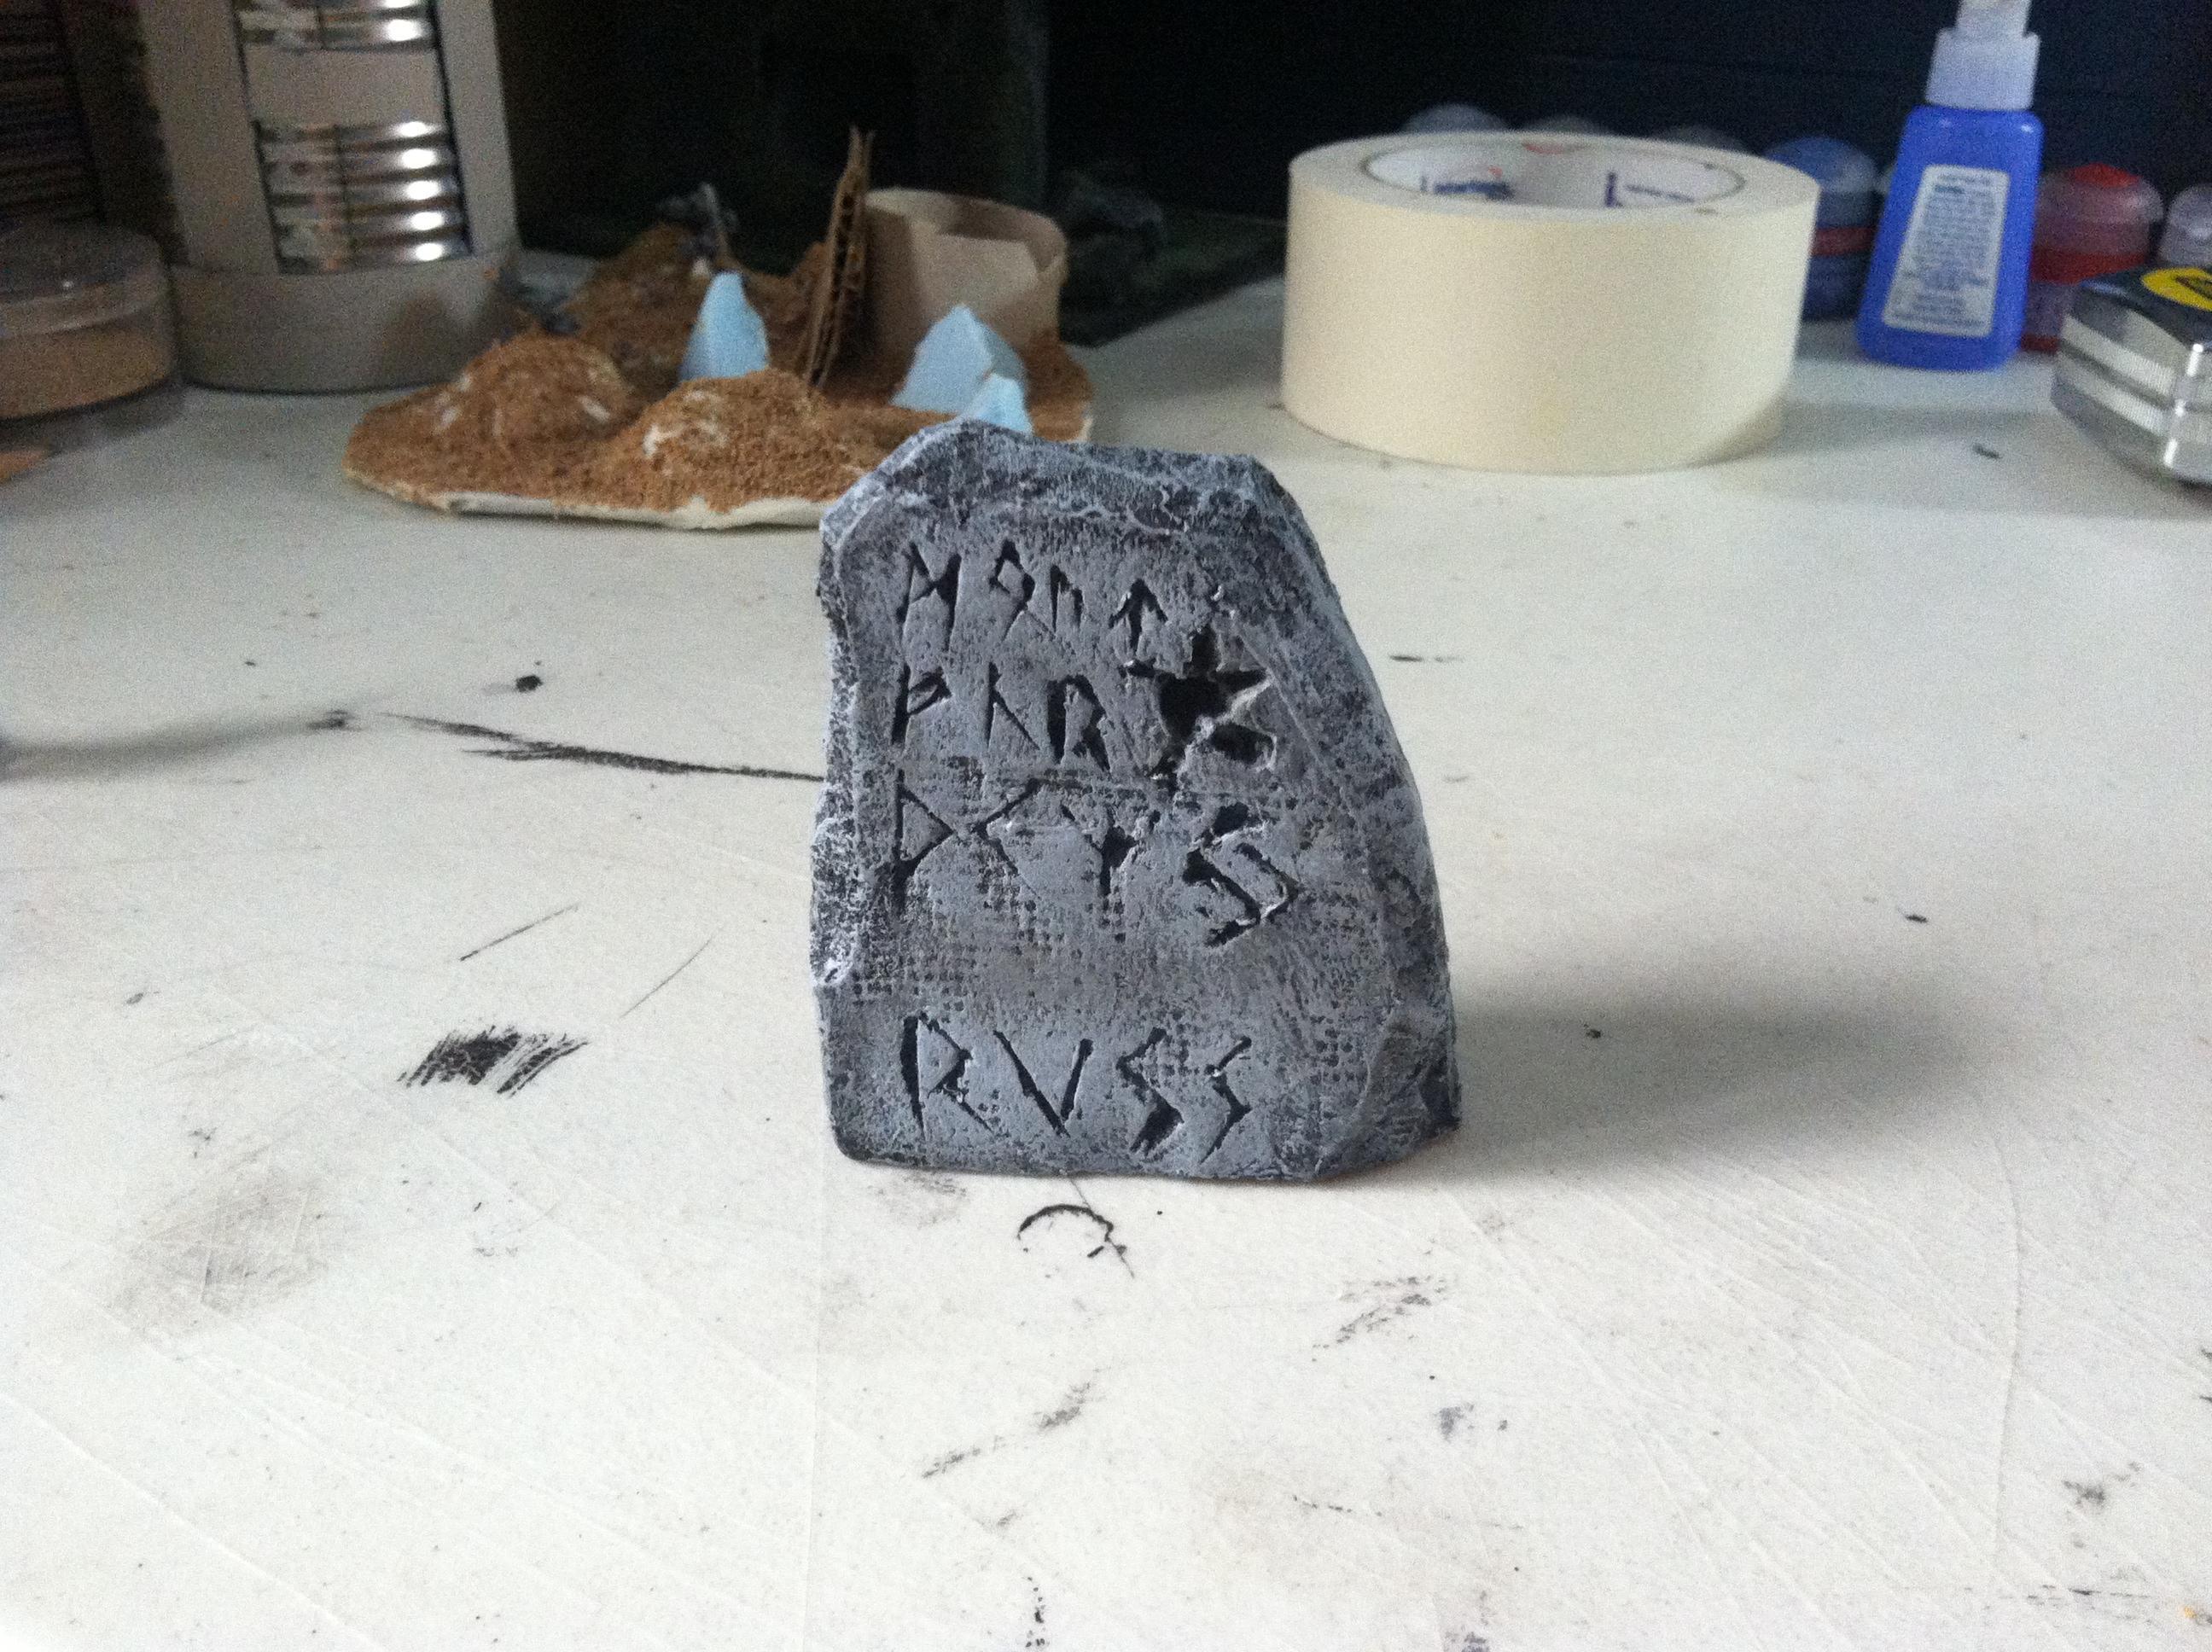 Beginner, Cardboard, Insulation, Painting, Rubble, Rune, Runestone, Space Wolves, Styrofoam, Terrain, Viking, Warhammer 40,000, Warhammer Fantasy